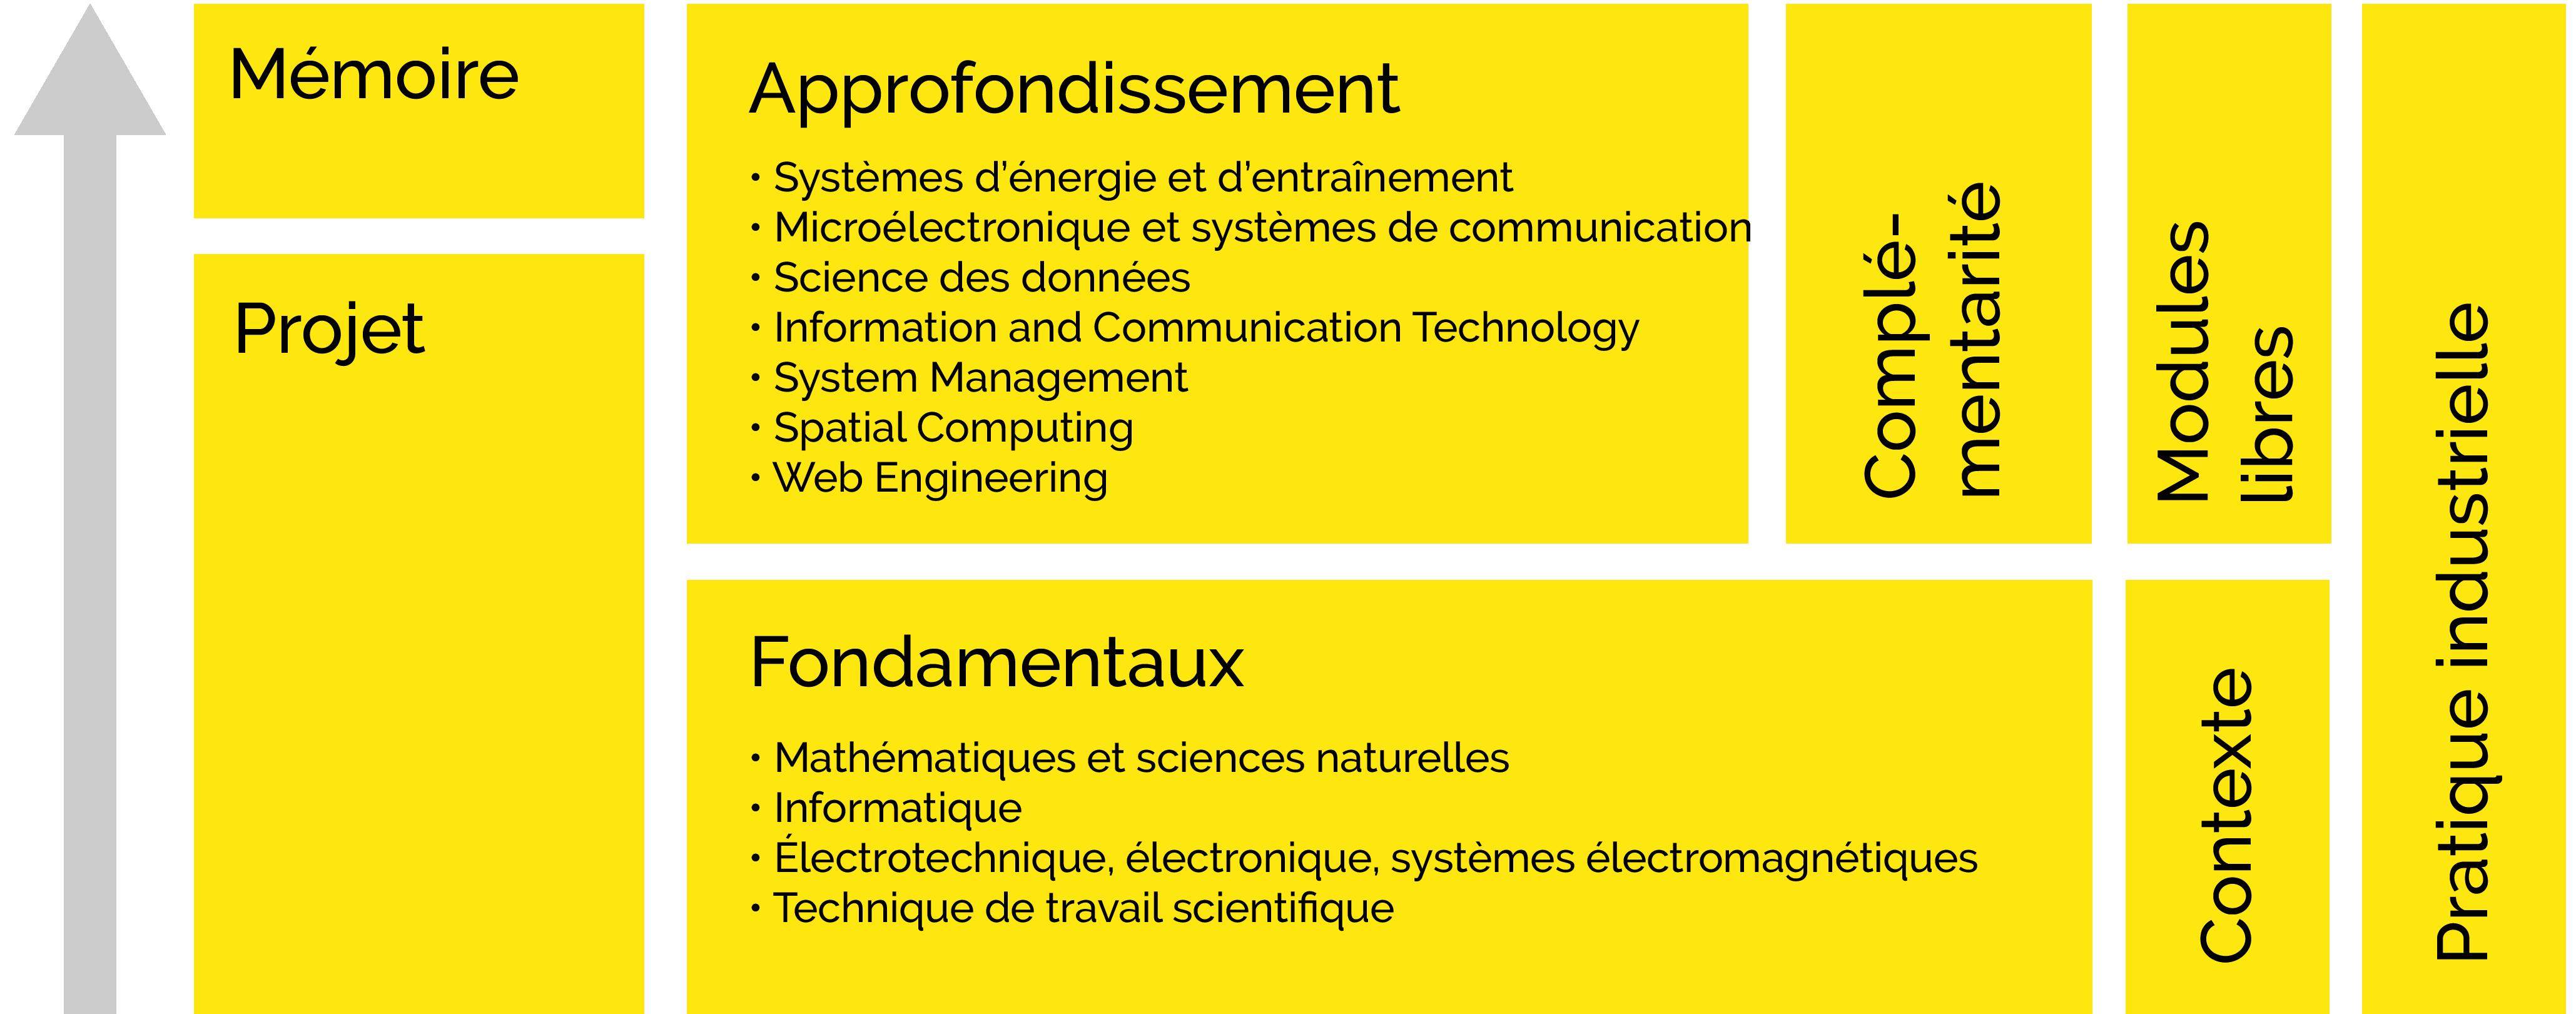 aufbau-studium-ICT-ht-fhnw-fr.png